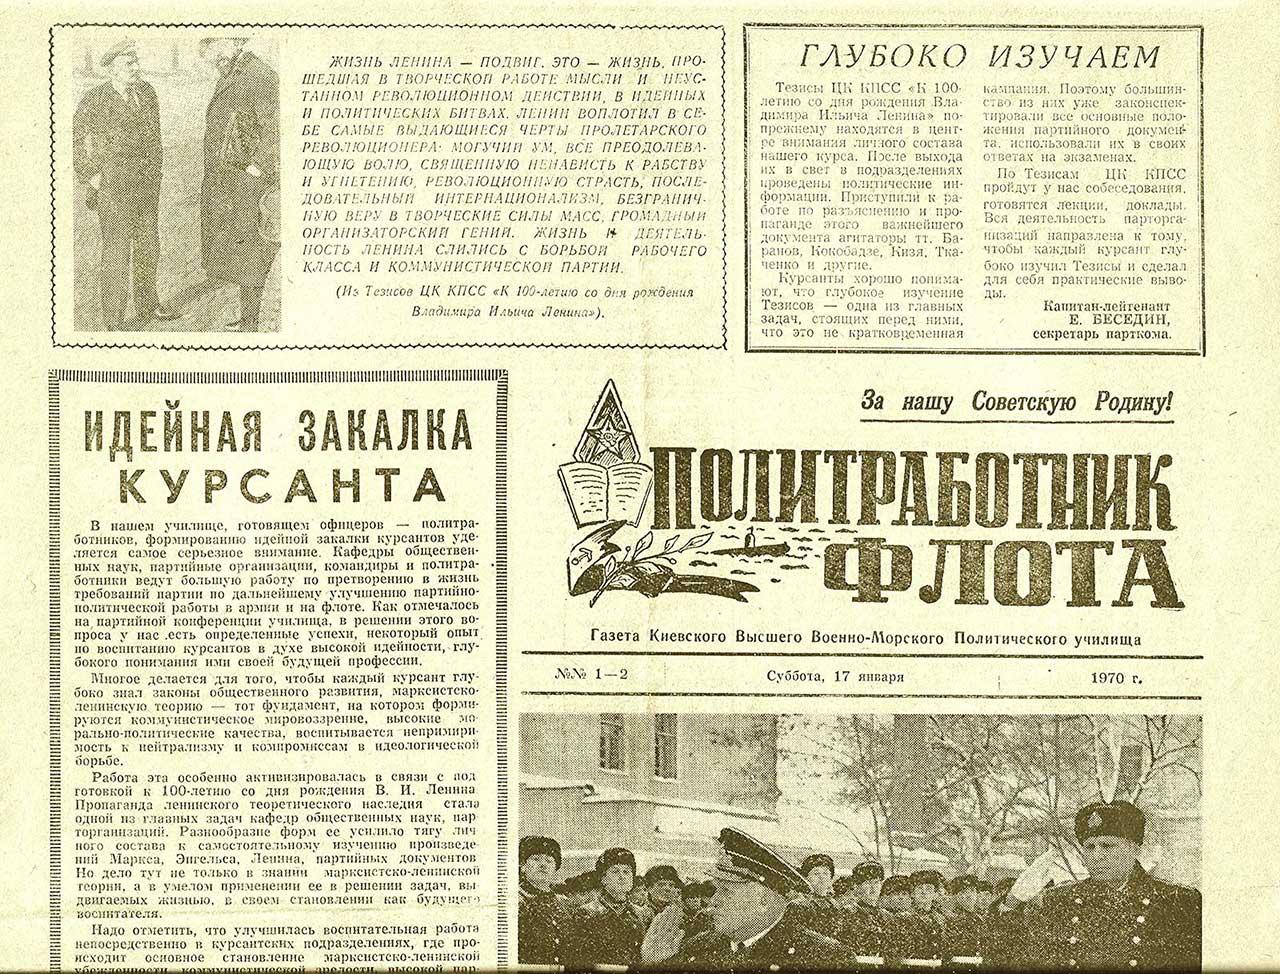 Газета «Политработник флота»,